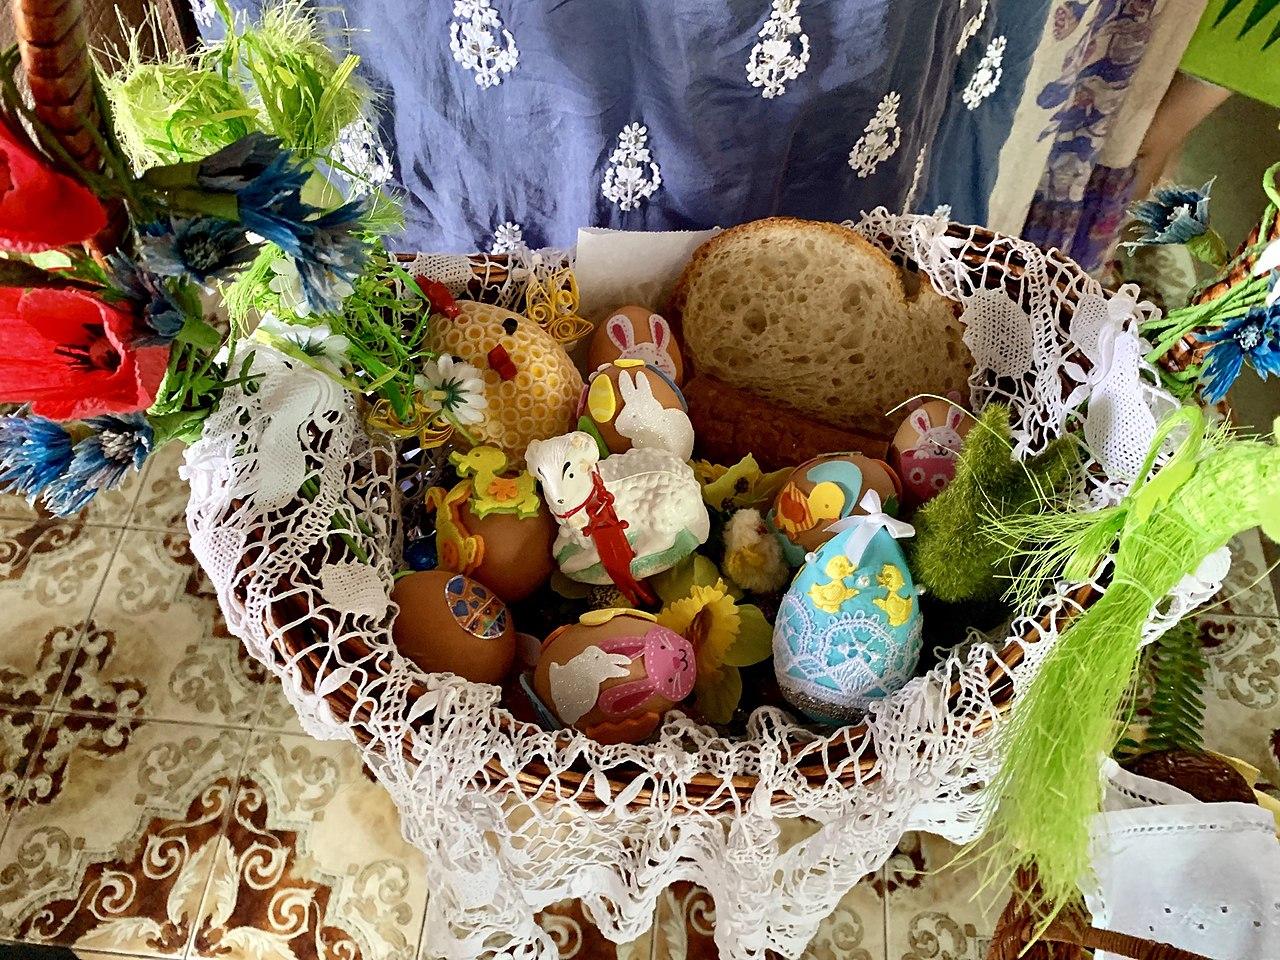 Święconka, Blessing Easter Basket at the Polish church in Brisbane (20 April 2019, 11:33:30)